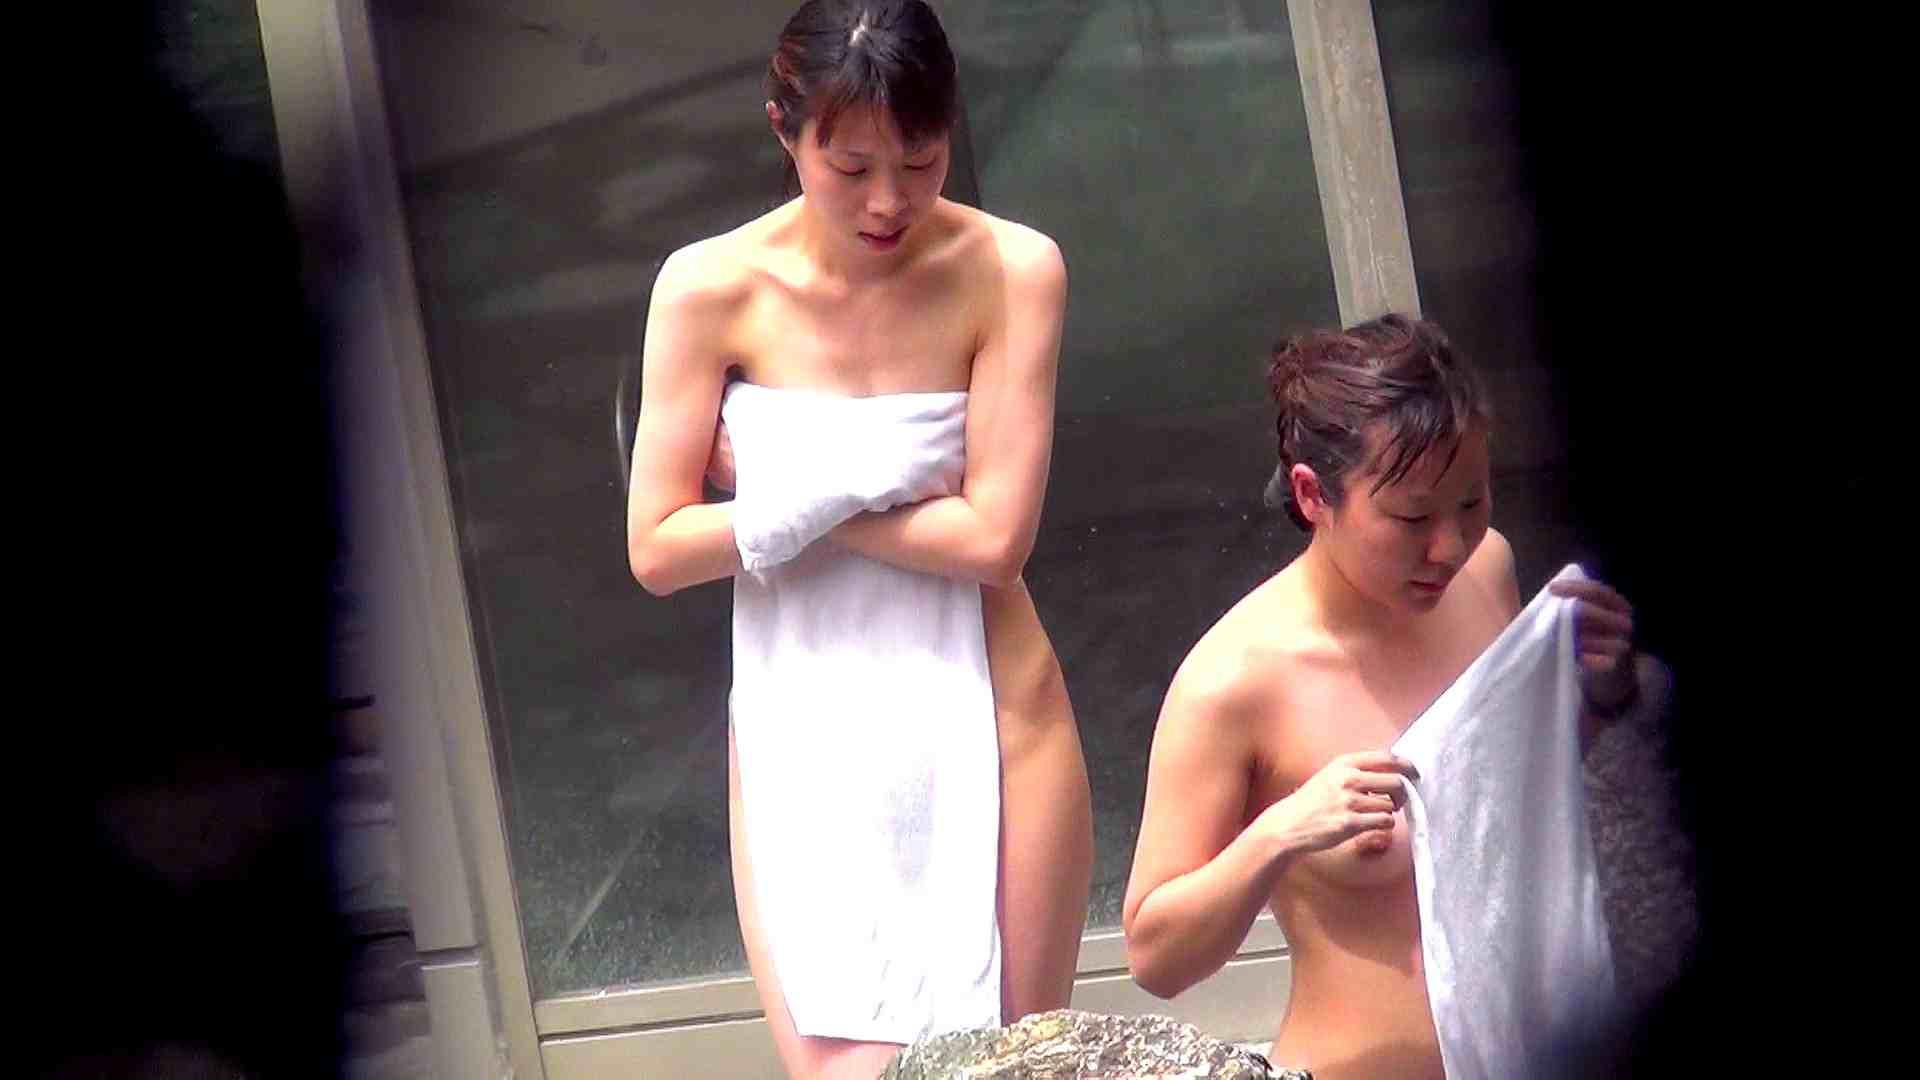 Aquaな露天風呂Vol.292 OLセックス 覗き性交動画流出 106画像 77